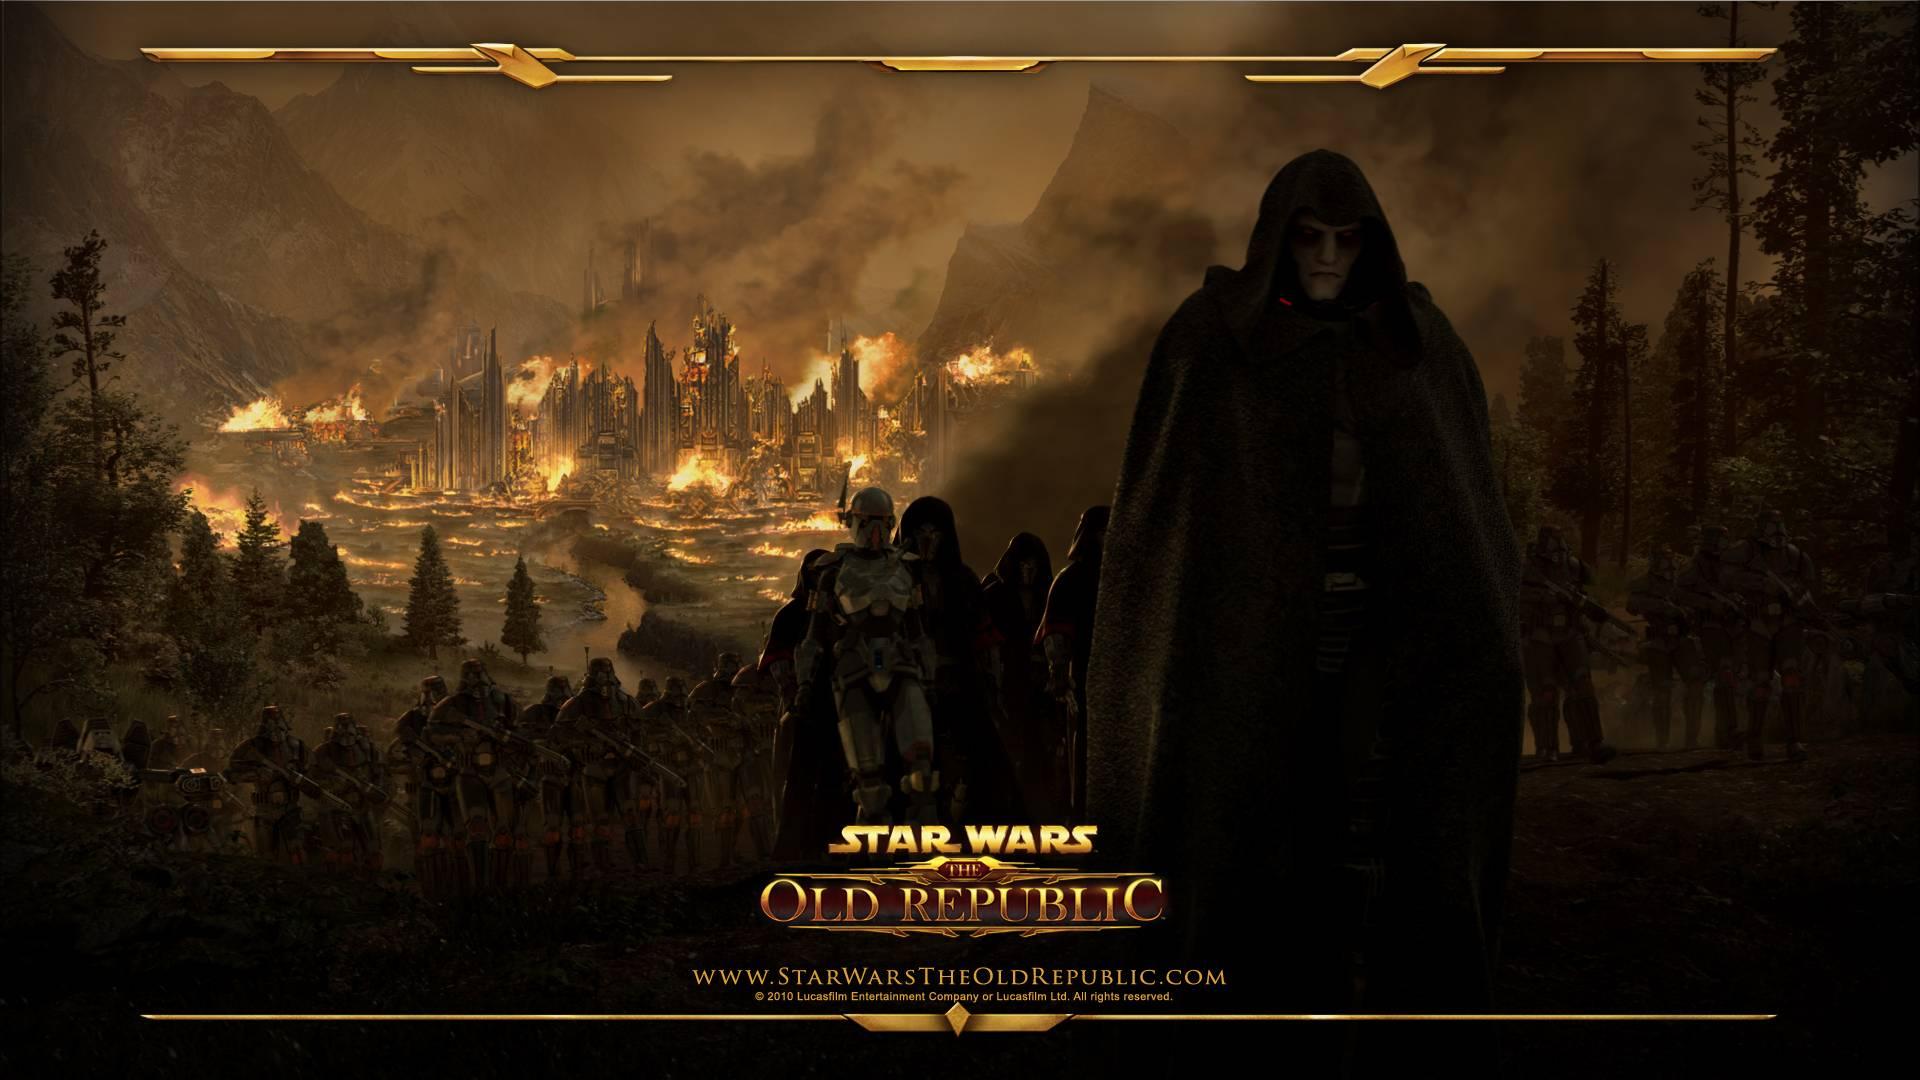 Star Wars The Old Republic wallpaper 6